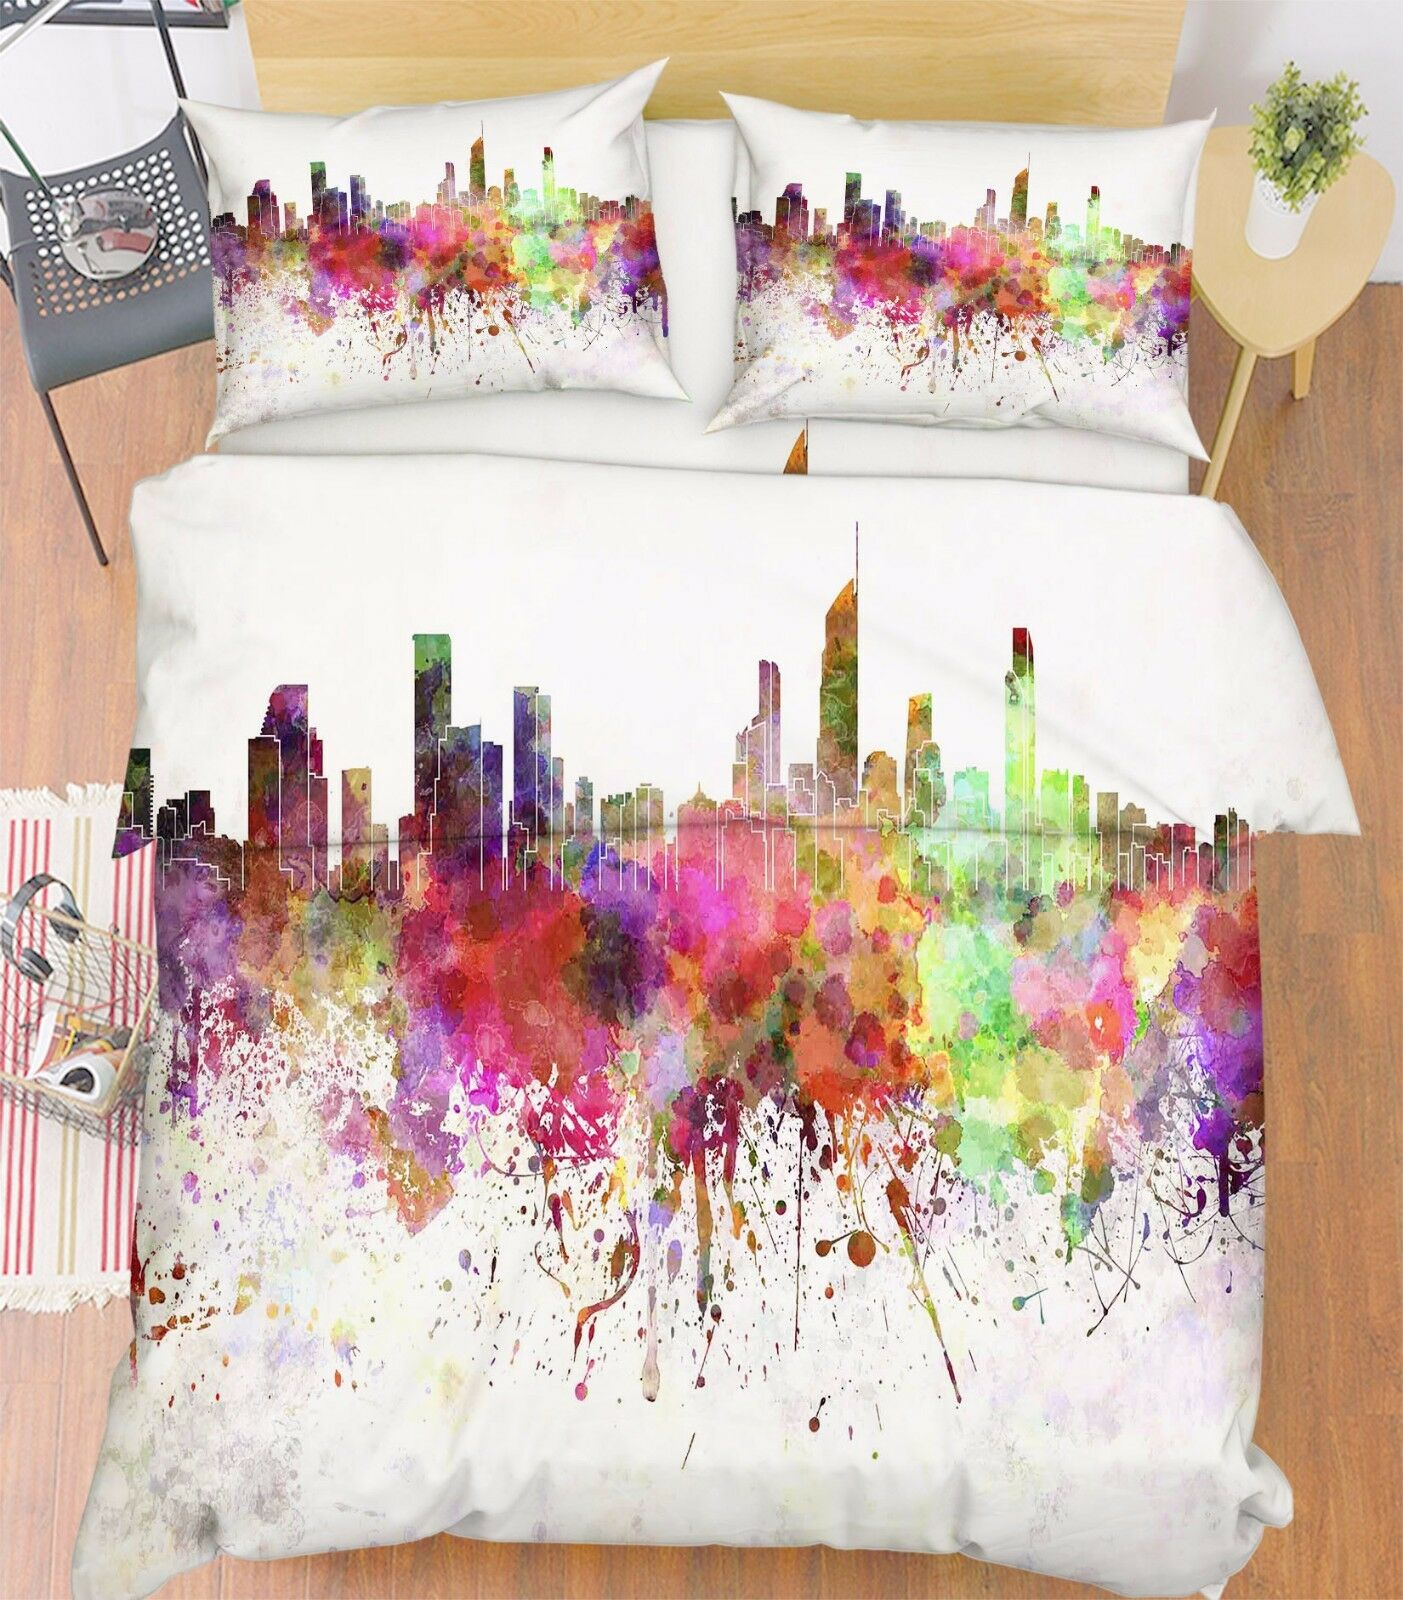 3D Paint City Sky 896 Bed Pillowcases Quilt Duvet Cover Set Single Queen UK Kyra